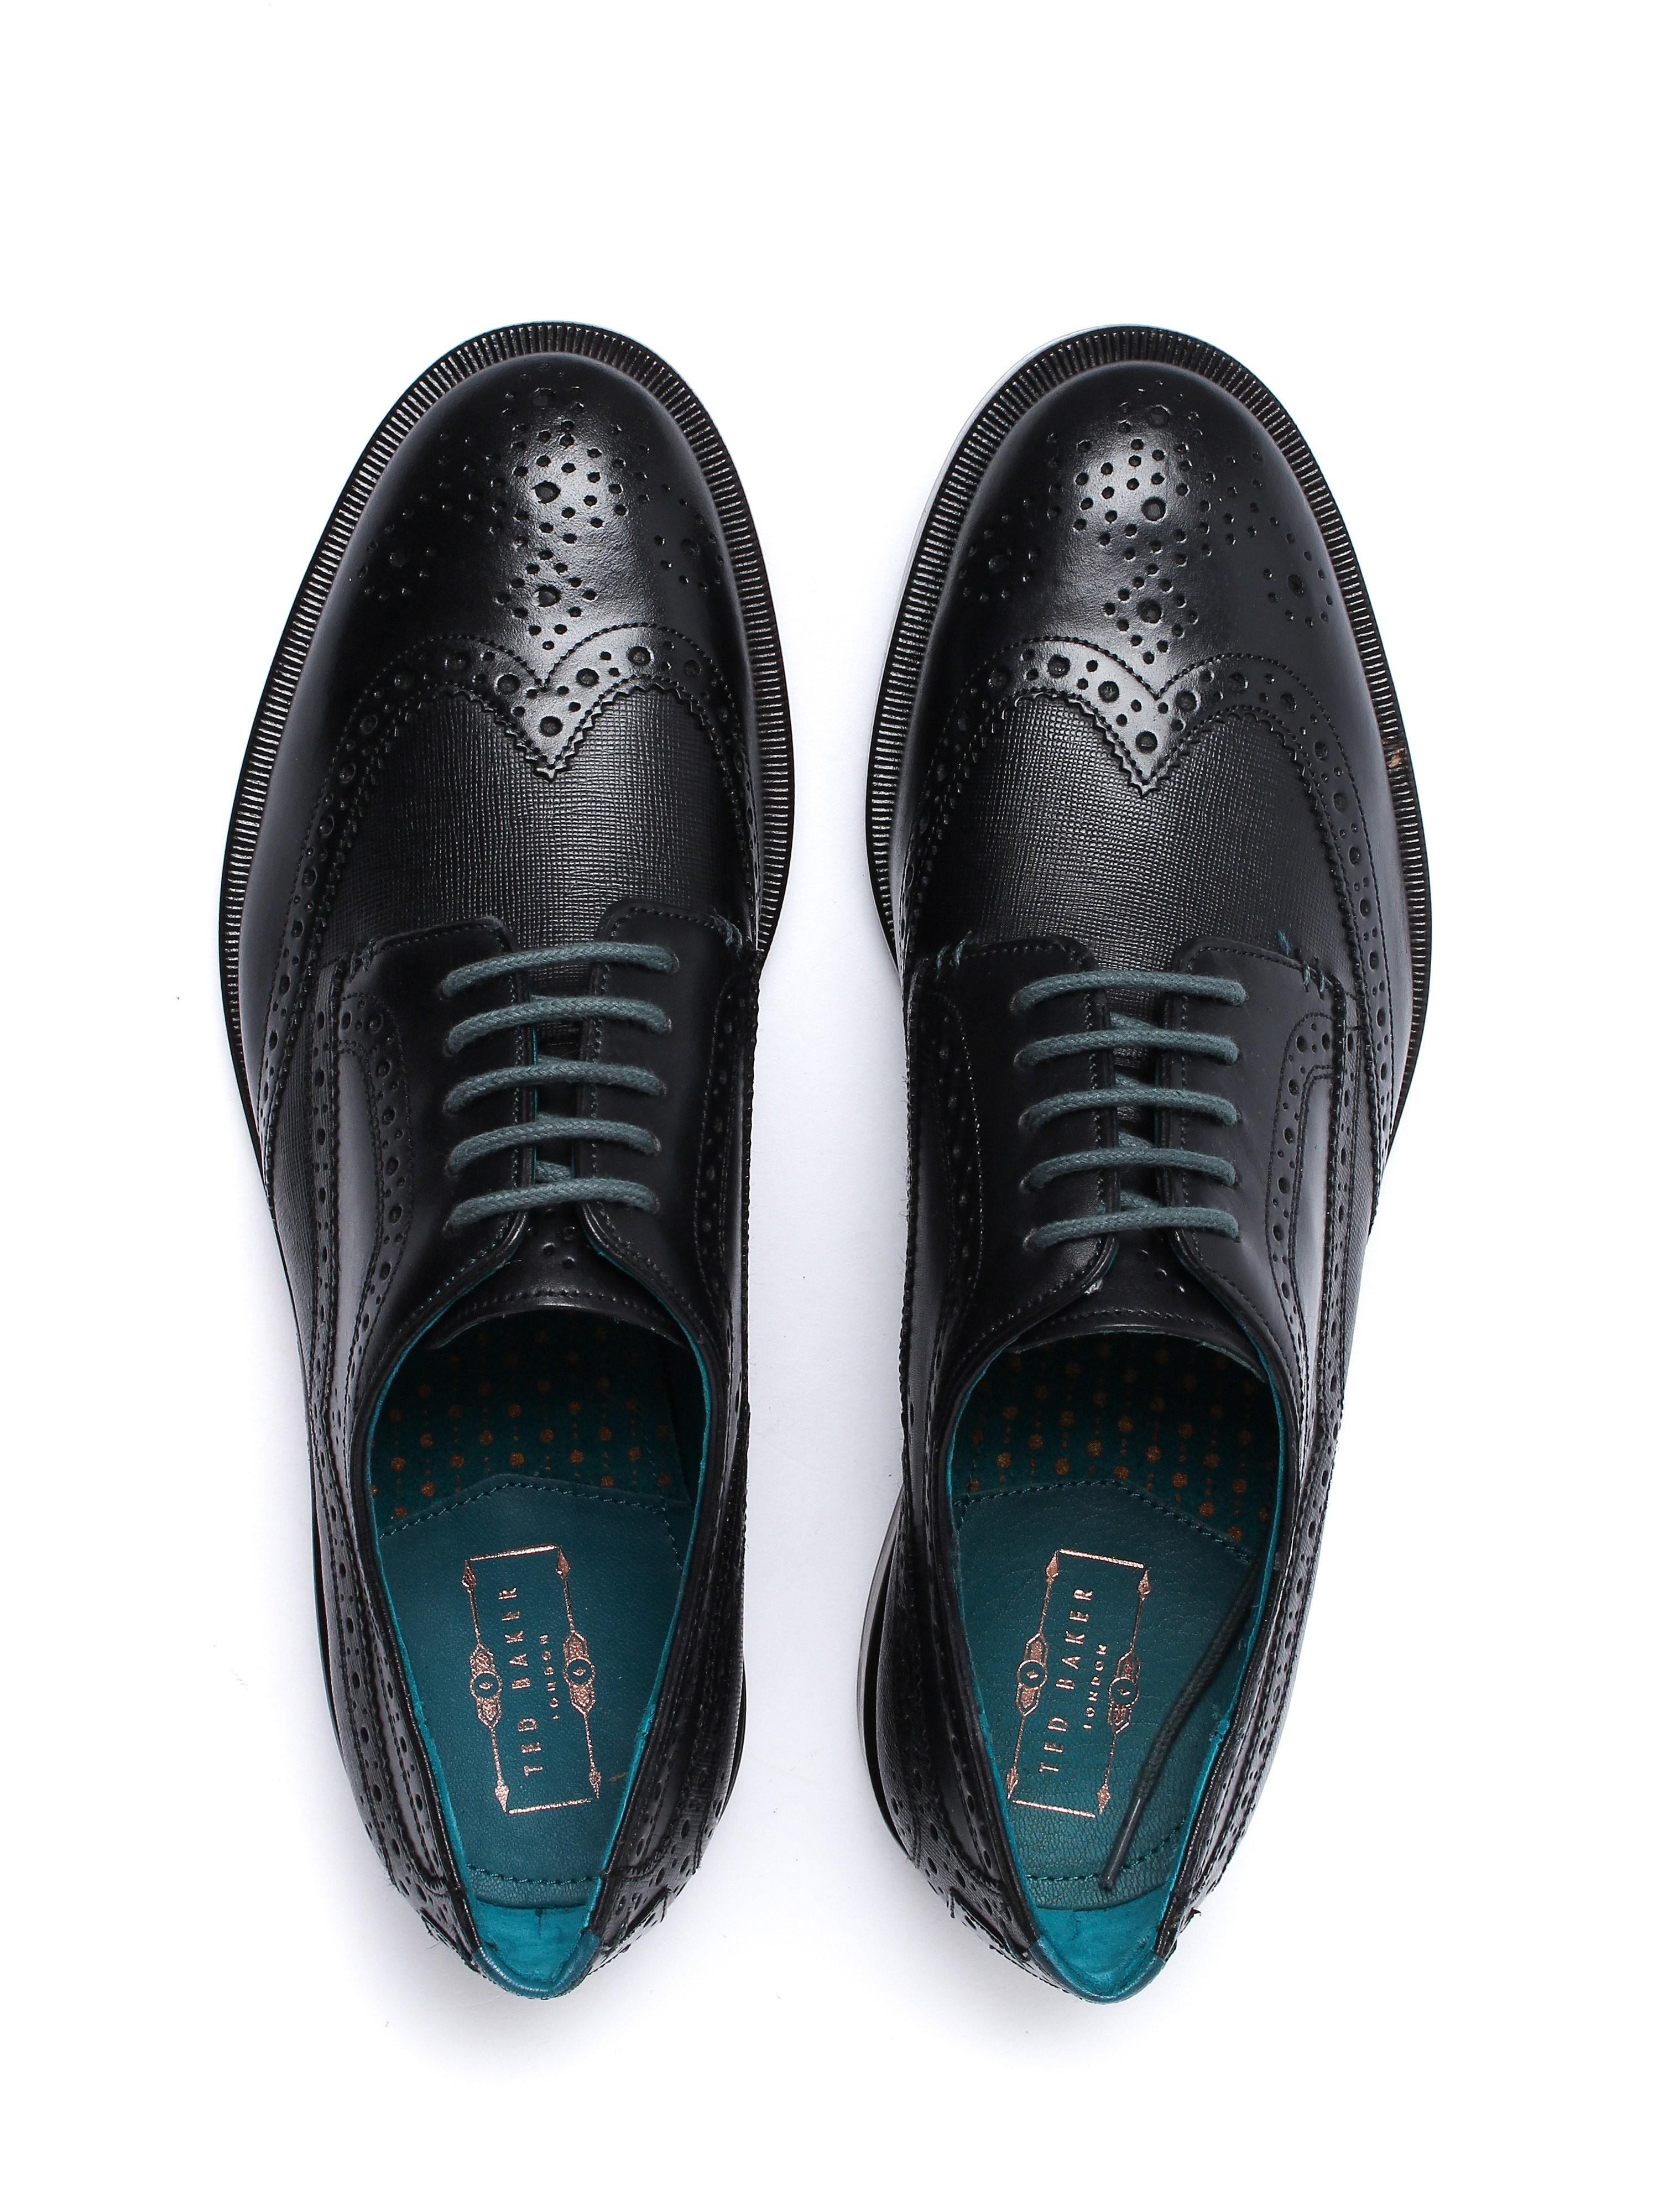 Ted Baker Men's Senape Oxford Brogues - Black Leather